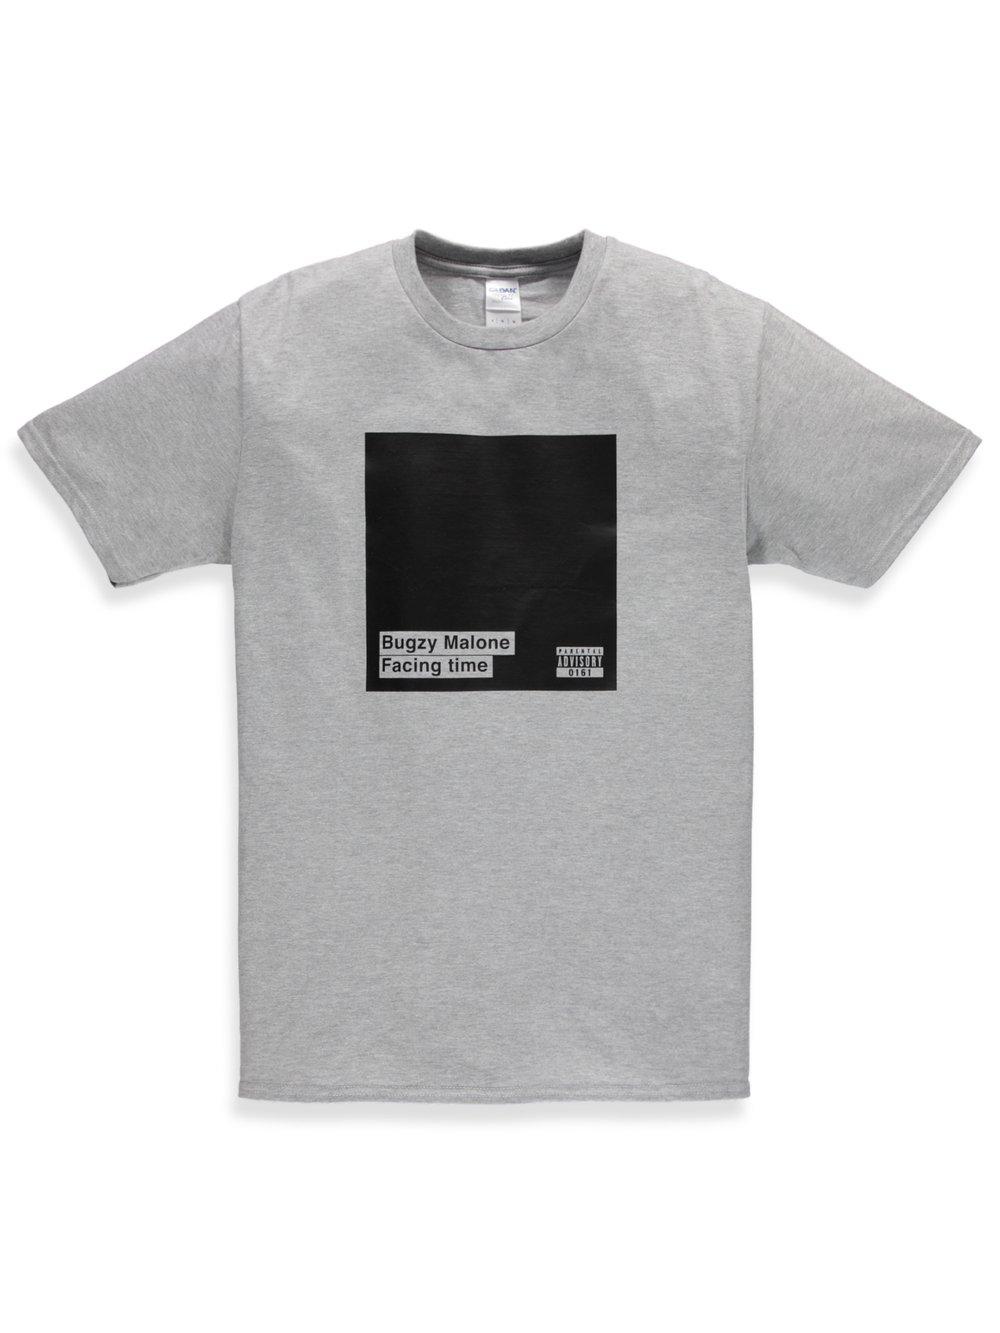 Image of Facing Time T-shirt